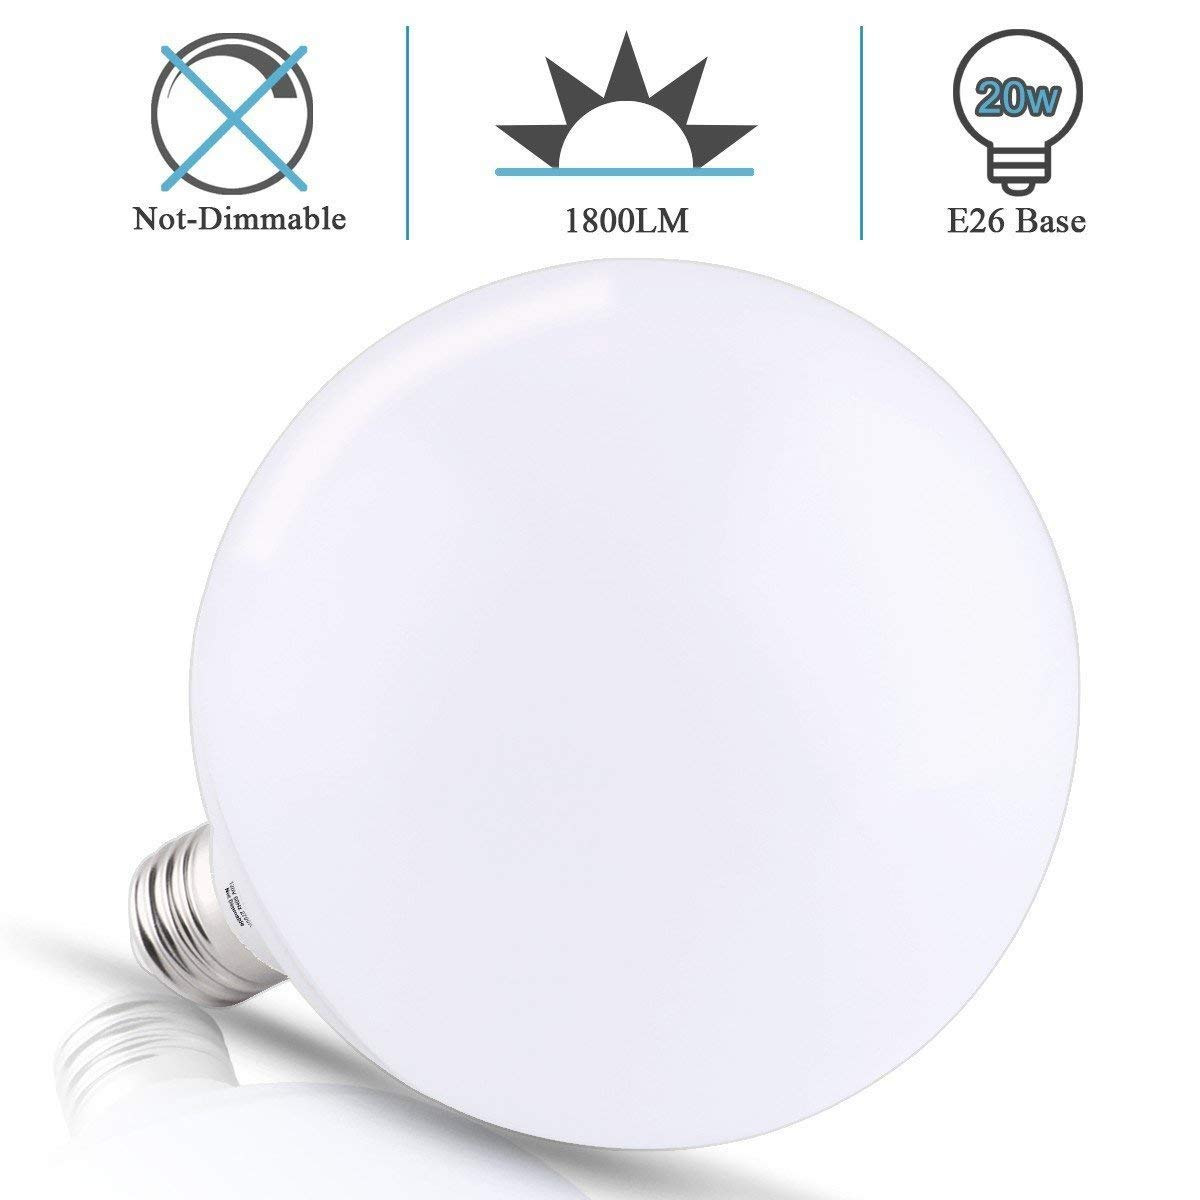 Not-Dimmable LOHAS LED G40 Replacement Bulb 20W Warm White 2700K 1800LM LED Globe Bulb for Garage Warehouse Office Light 200W Equivalent Globe Light Bulb E26 Screw Base